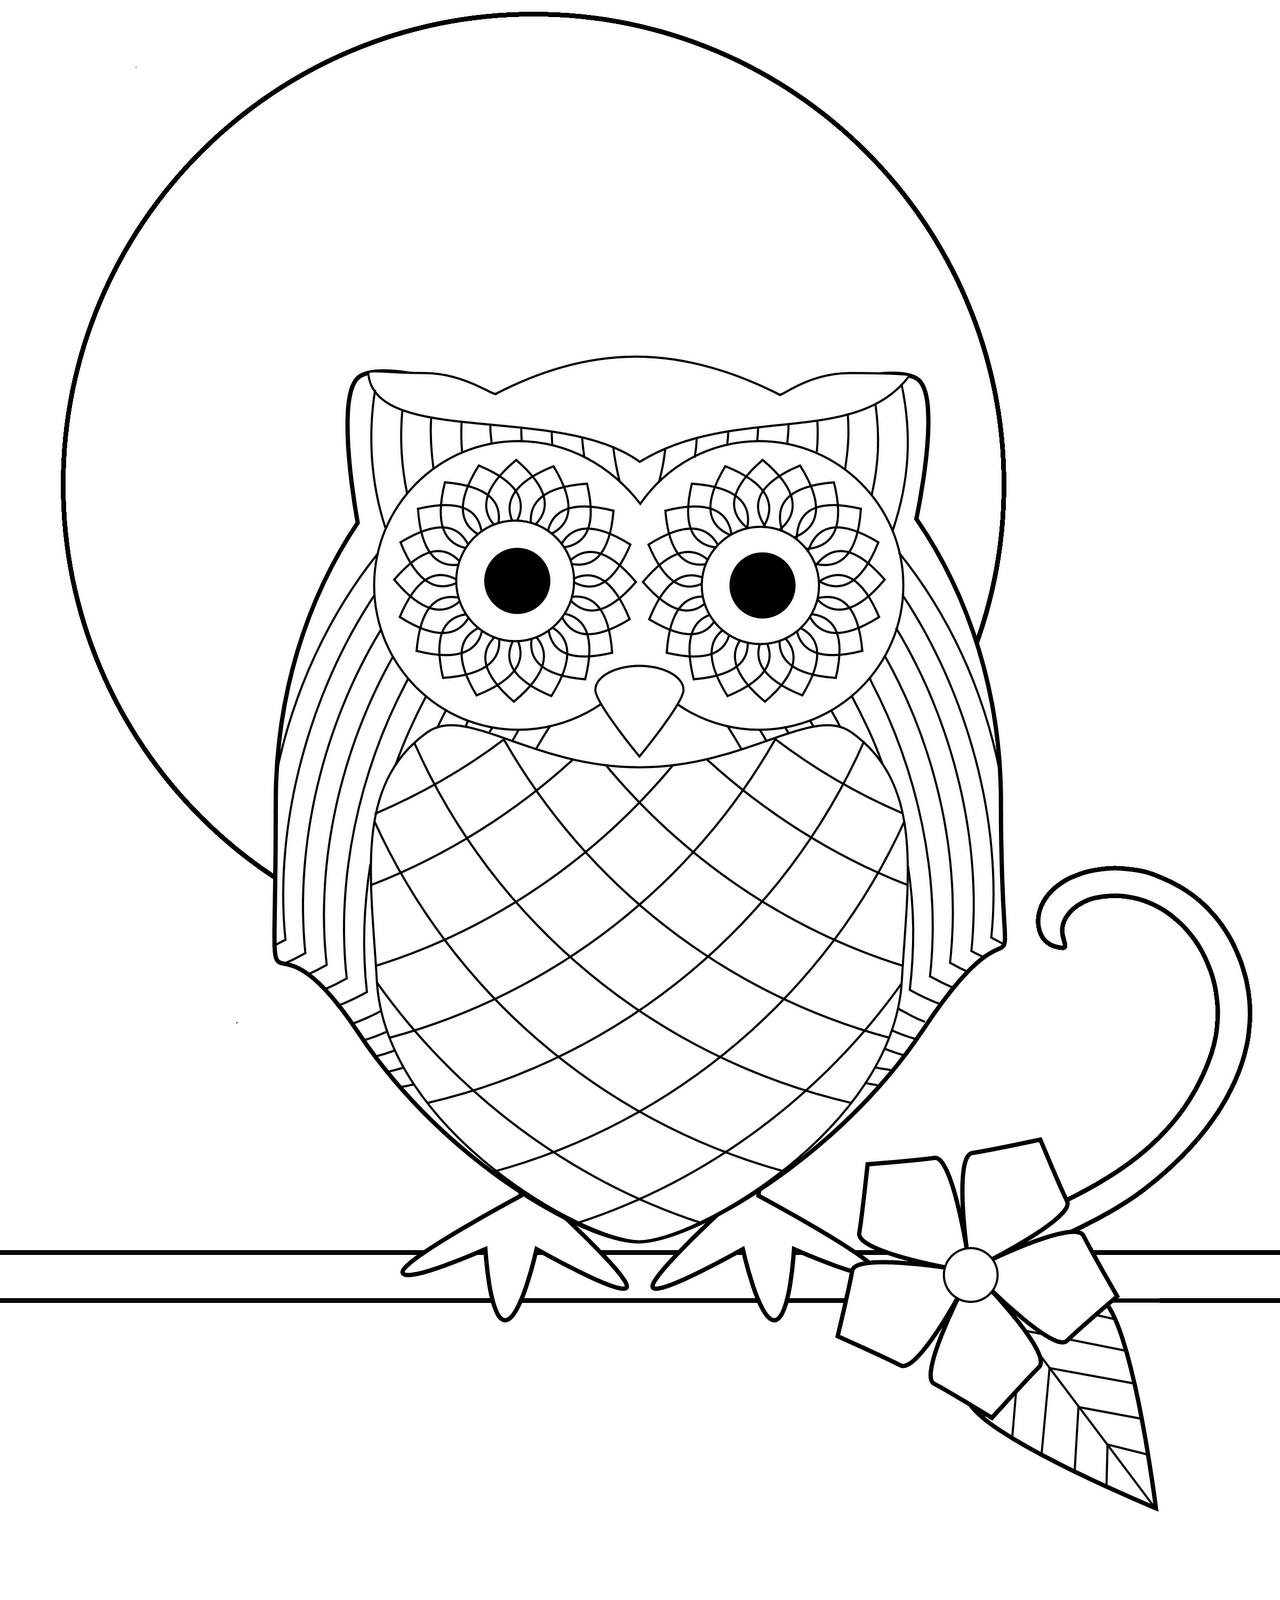 Pin Op Owl Coloring Pages Uil Kleurplaten